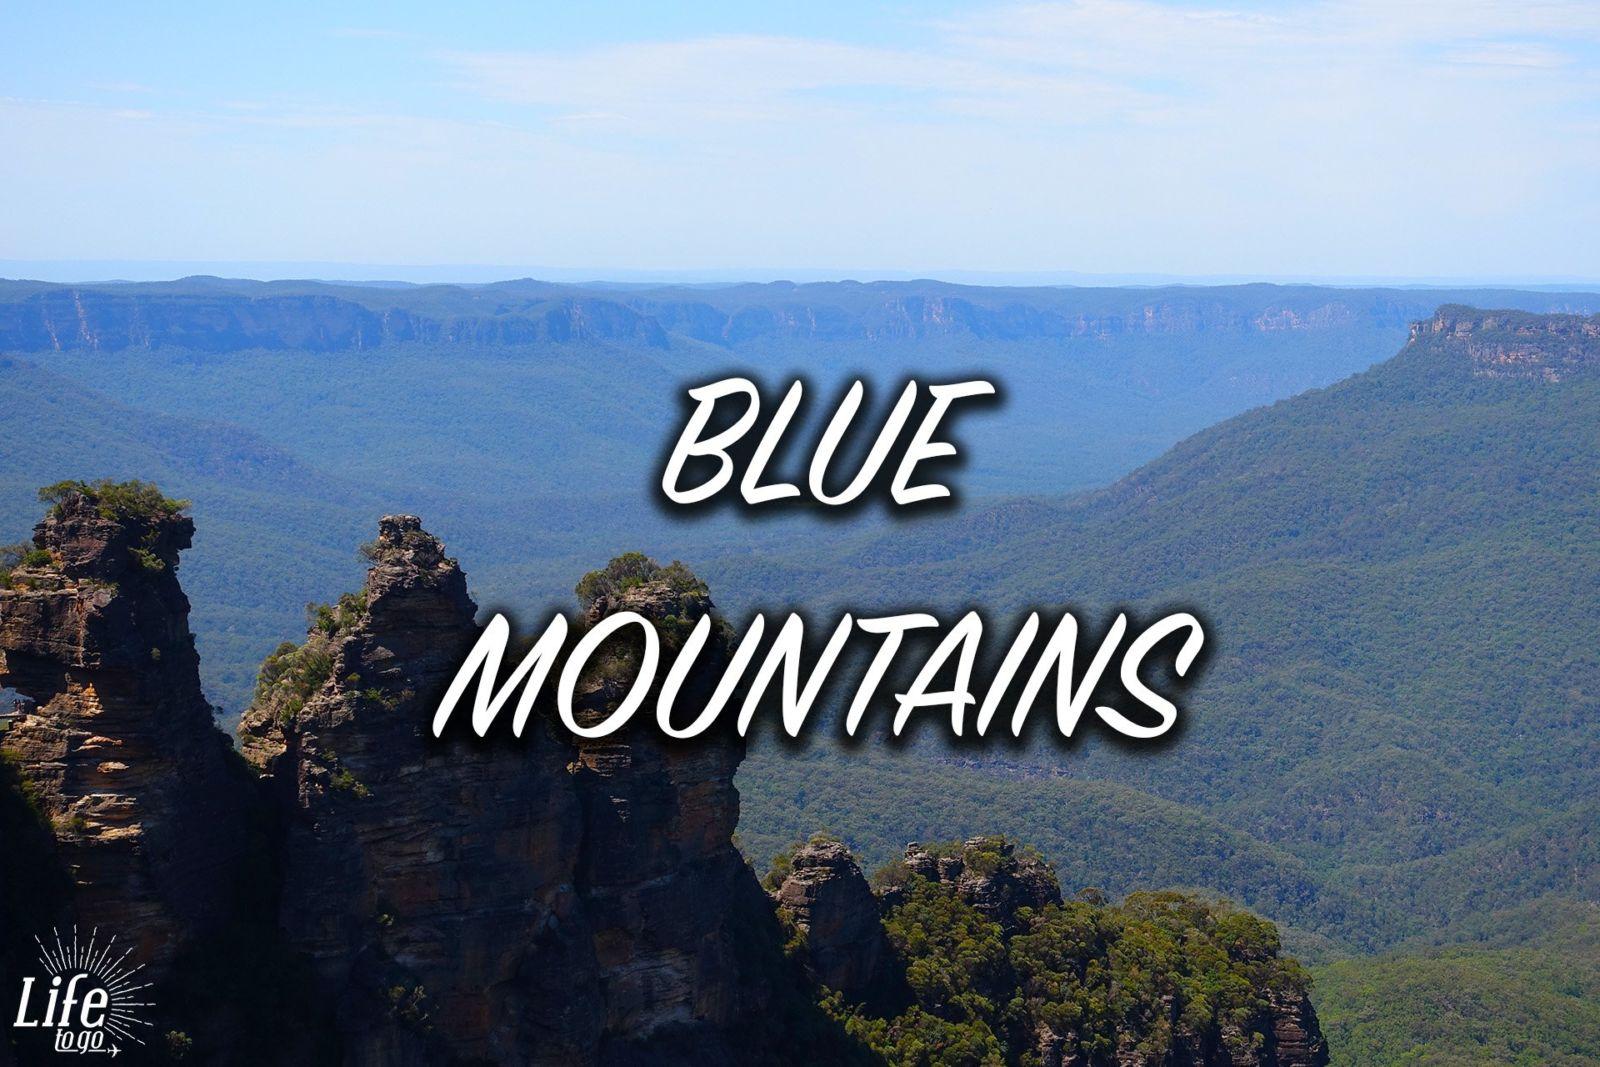 Ausflug in die Blue Mountains - Blue Mountains Tour